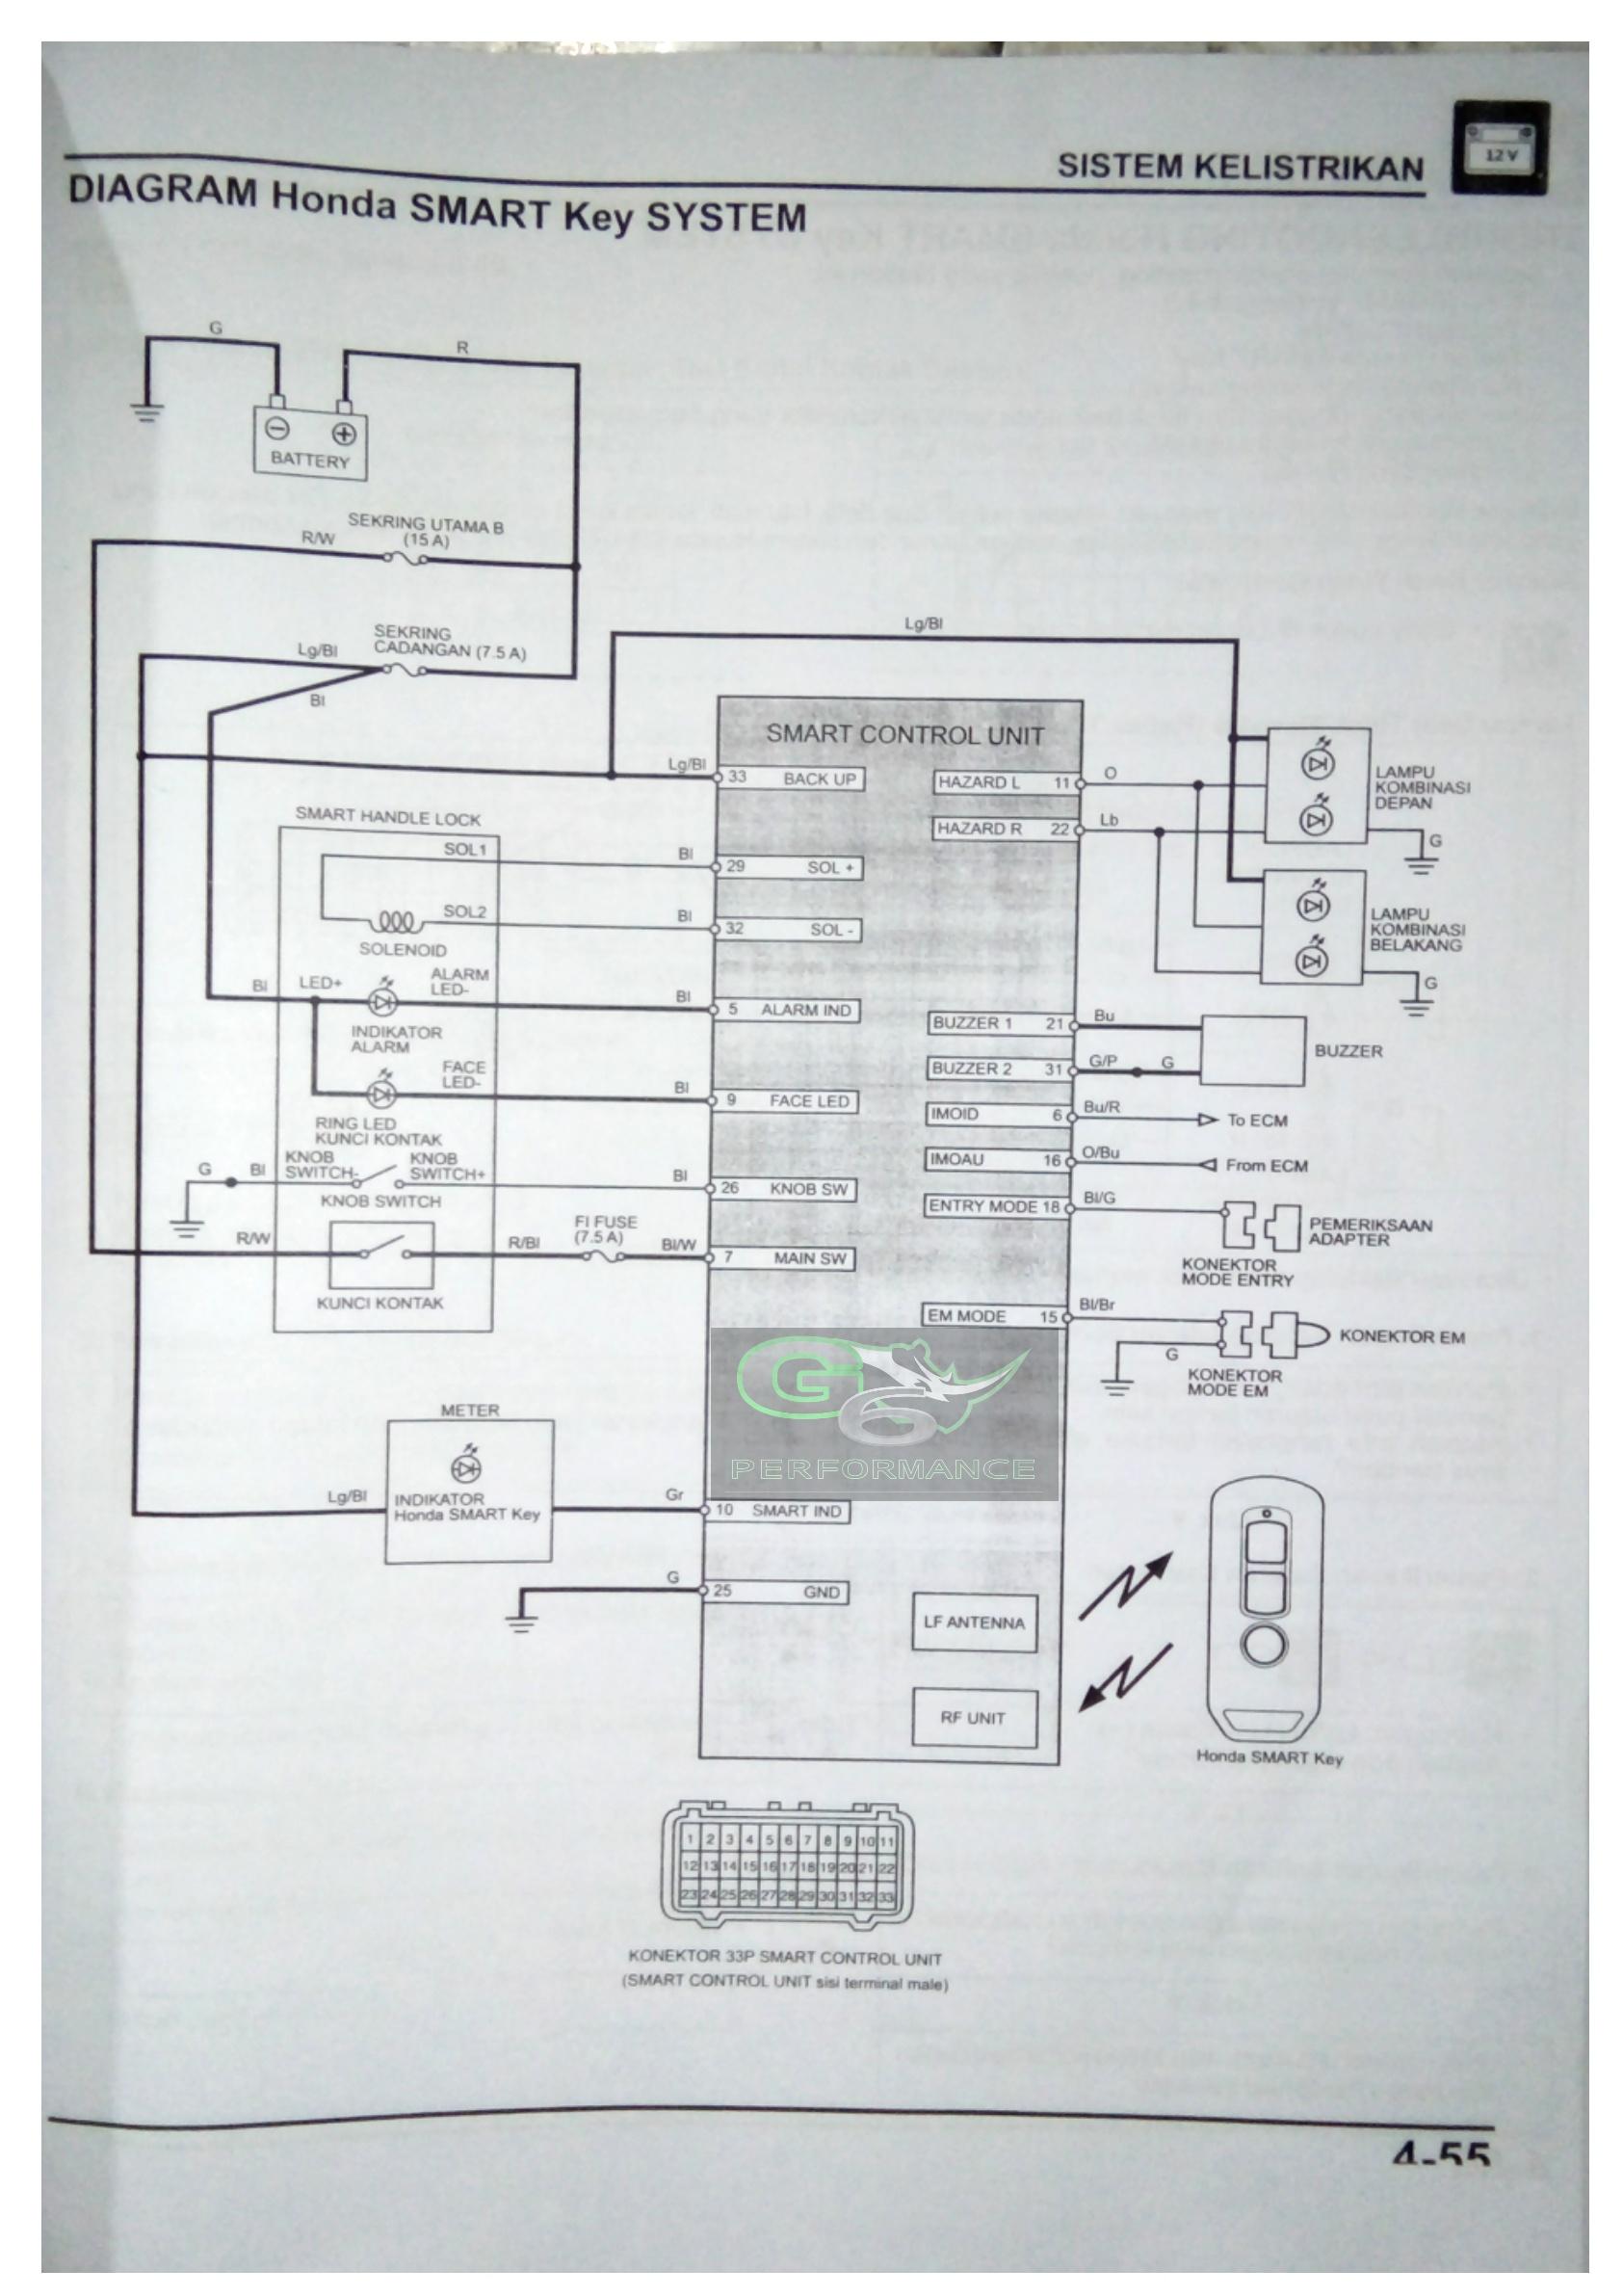 hight resolution of electric wiring system diagram honda new pcx 150 2018 gisix s blog honda scoppyi 2015 wiring diagram